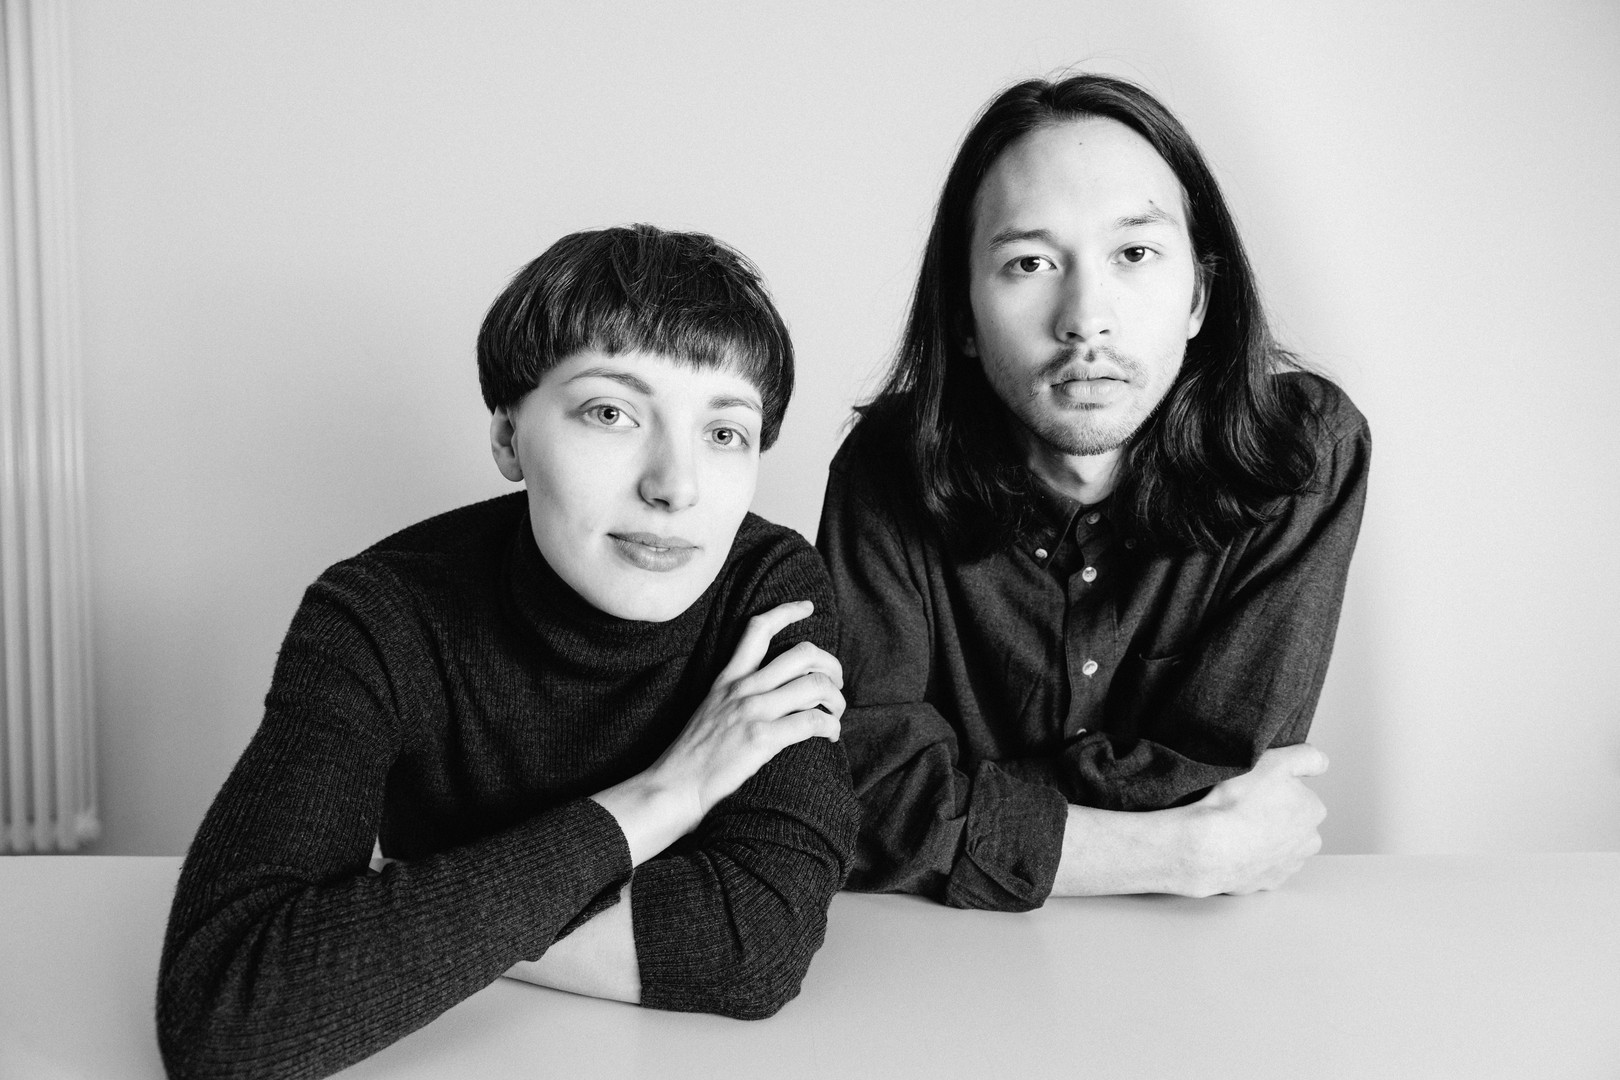 Janna Berger & Kai Wenas